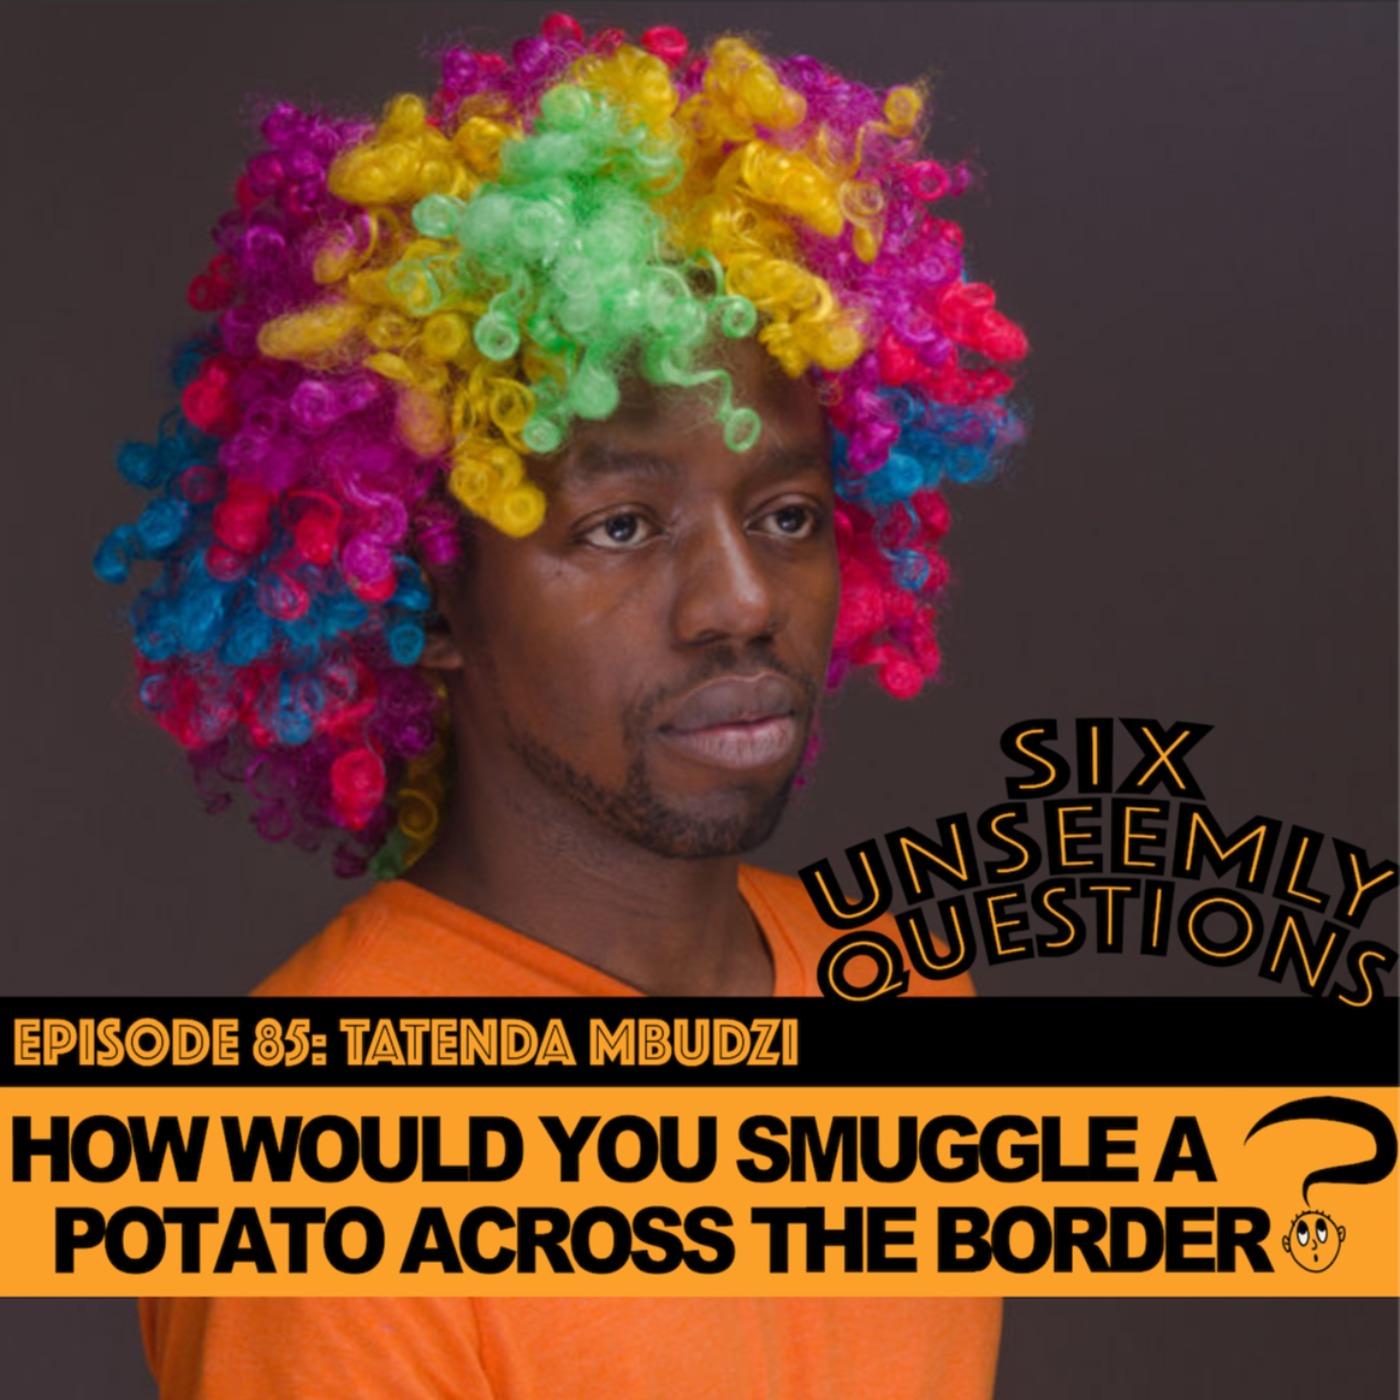 How Would You Smuggle A Potato Across The Border?